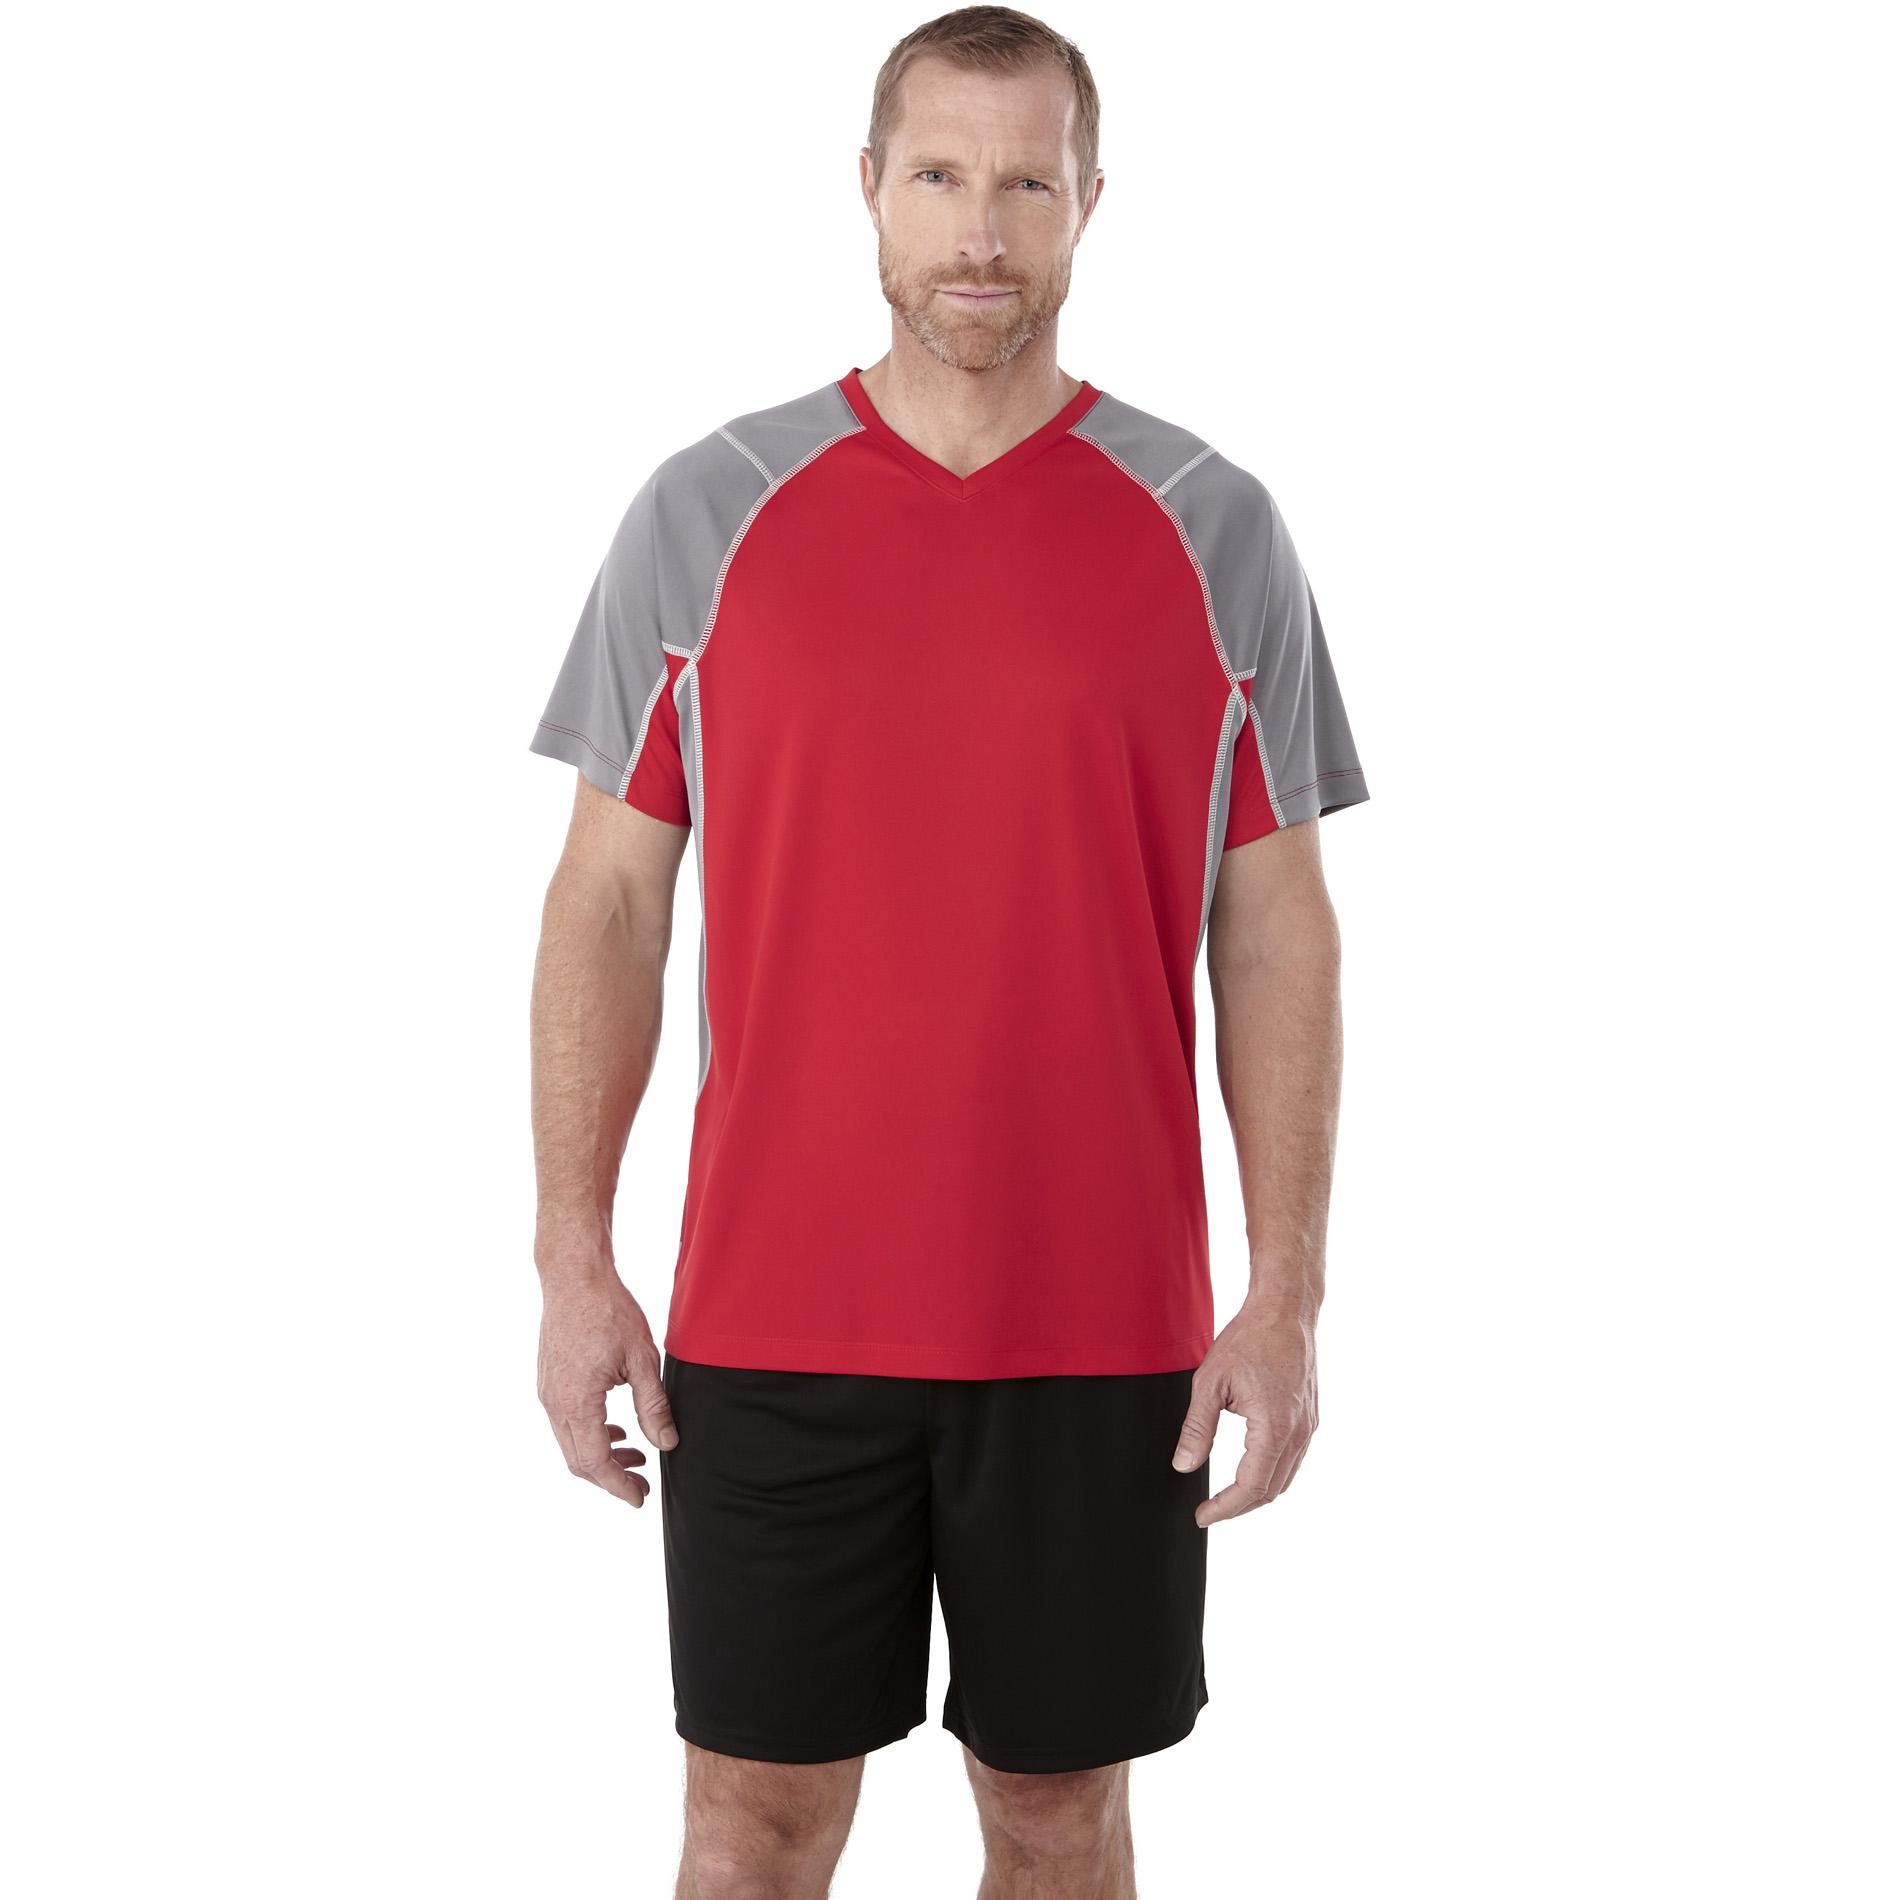 Elevate TM17813 - Men's TAKU Short Sleeve Tech Shirt